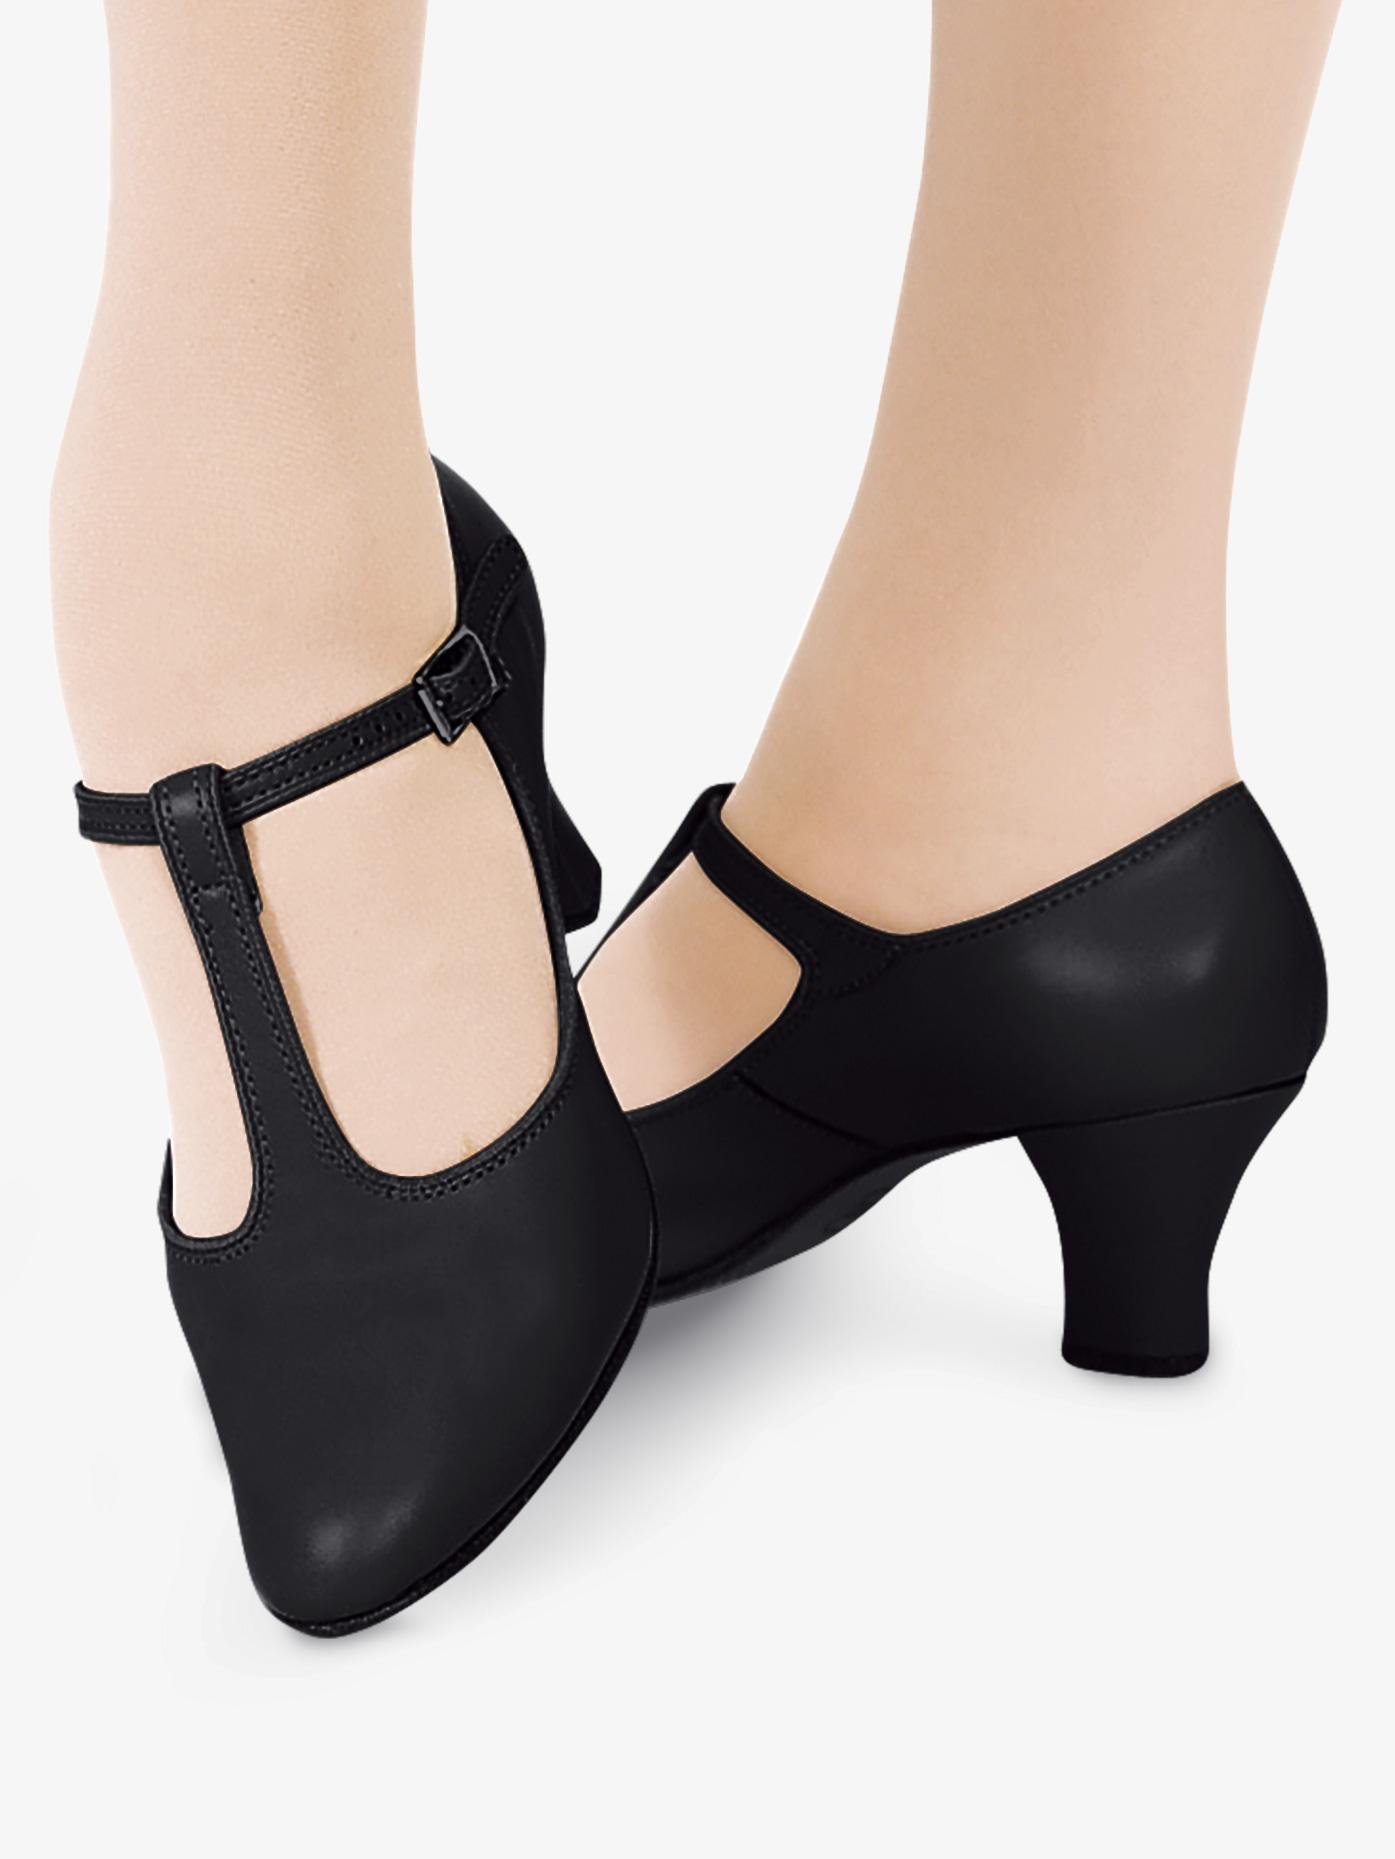 Capezio Adult T-Strap 2 Heel Character Shoes C700